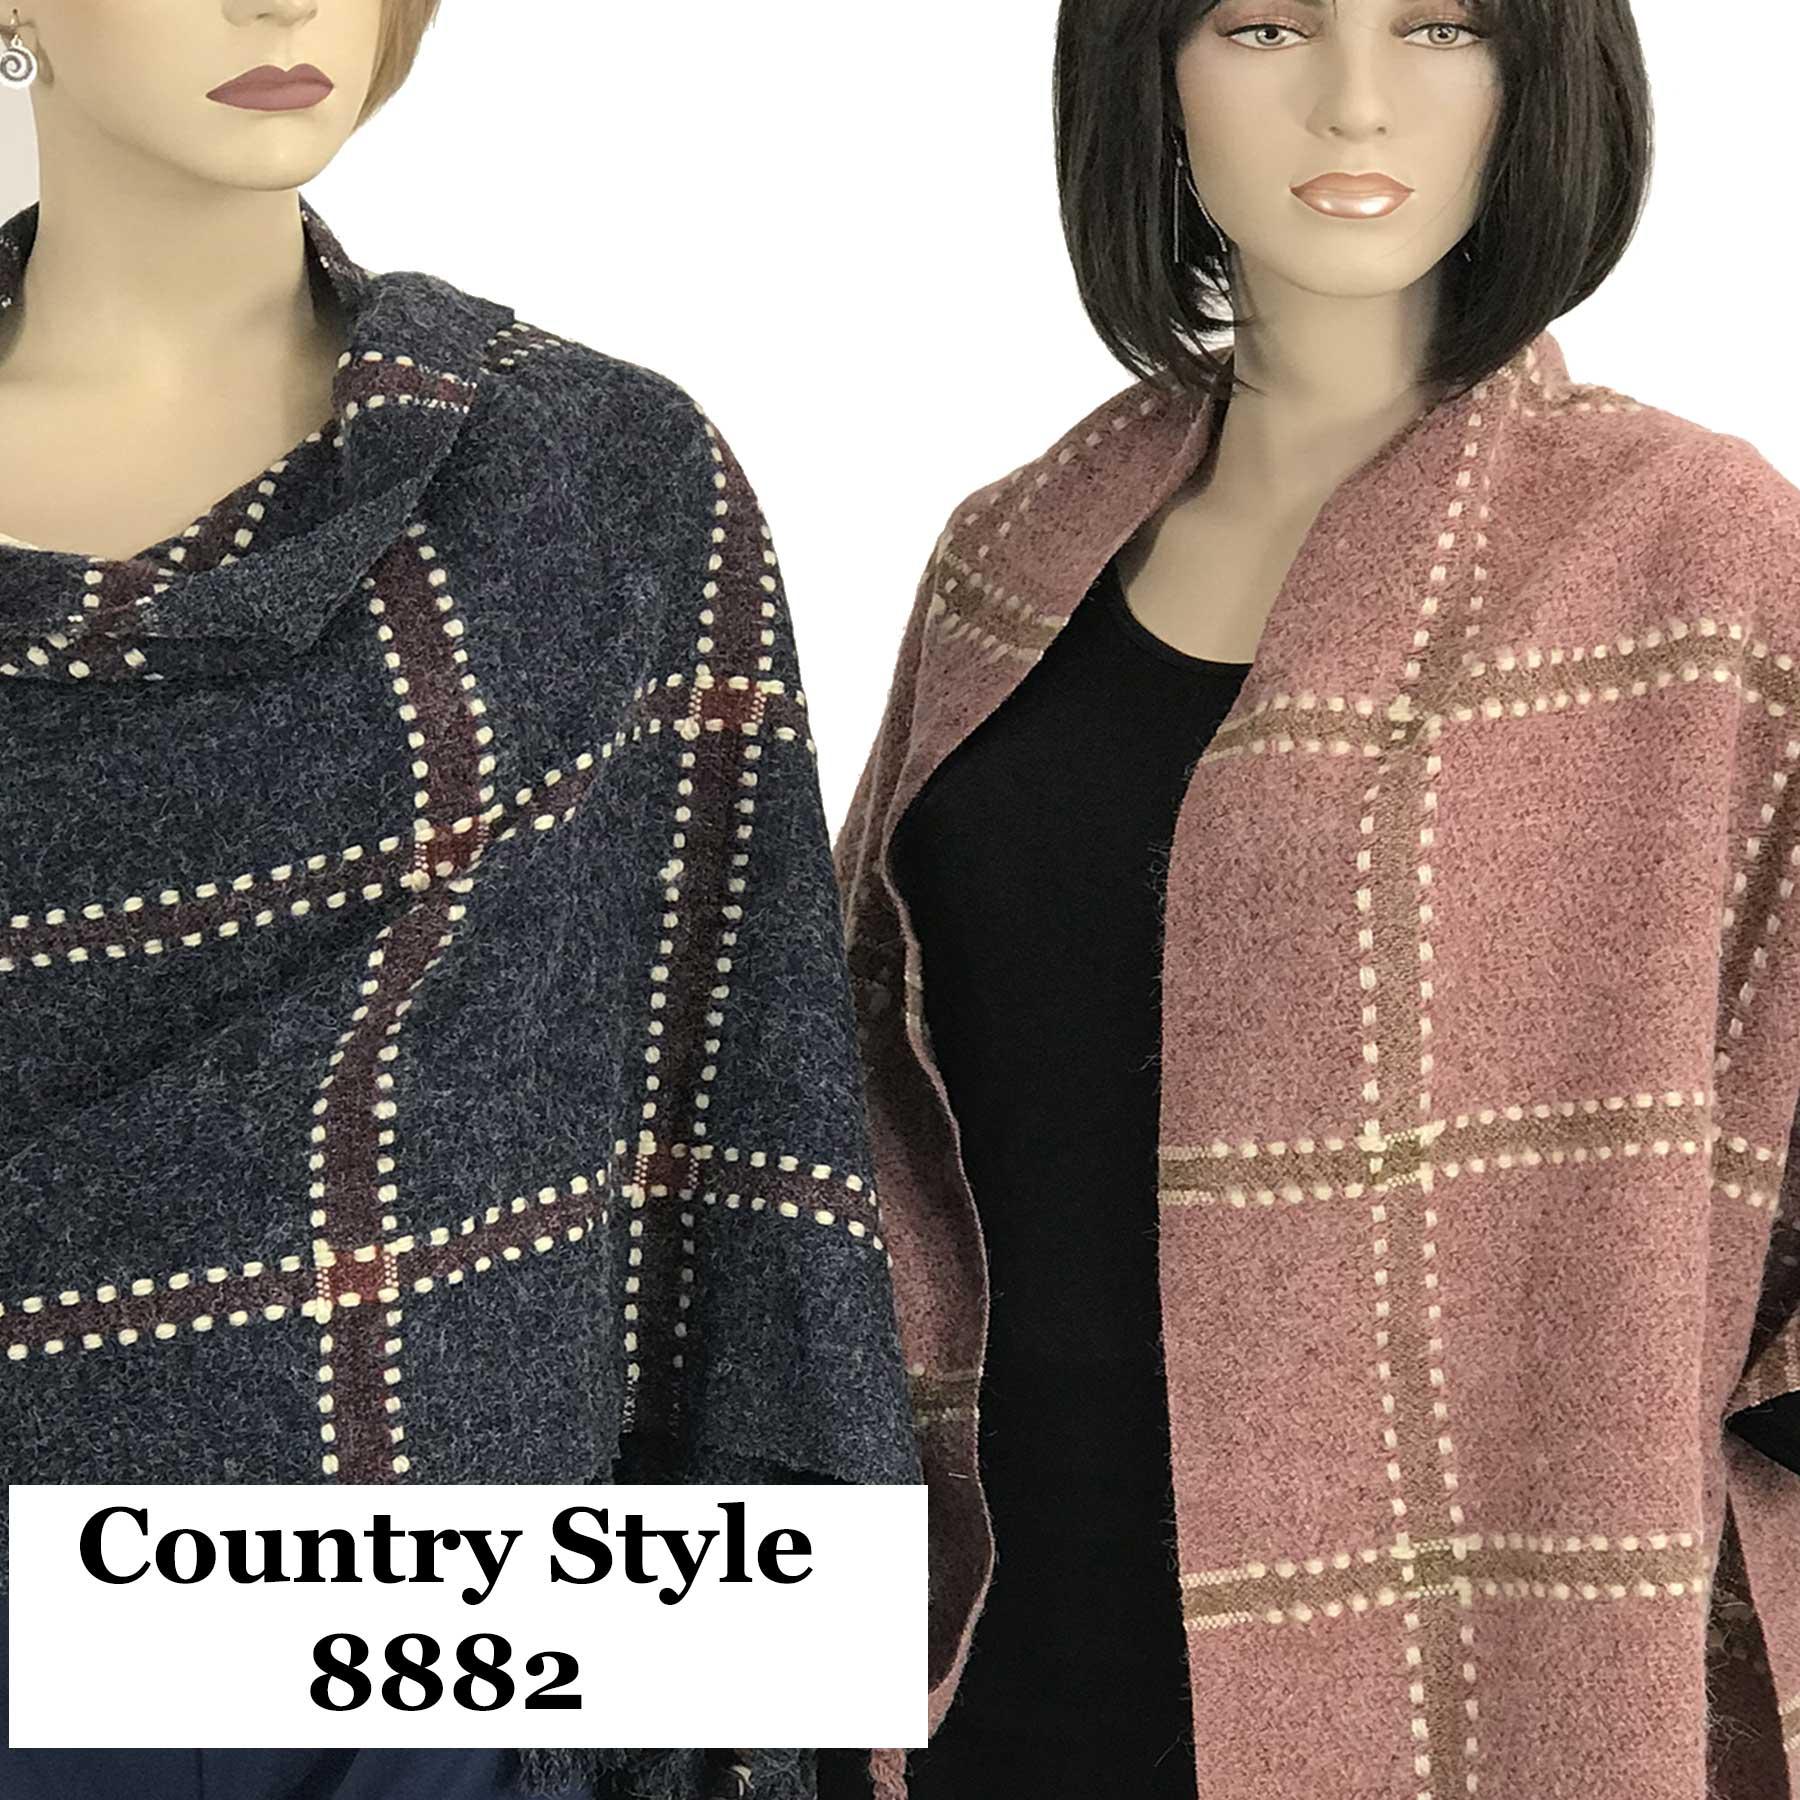 Oblong Scarves/Shawls - Stitch Check 8882